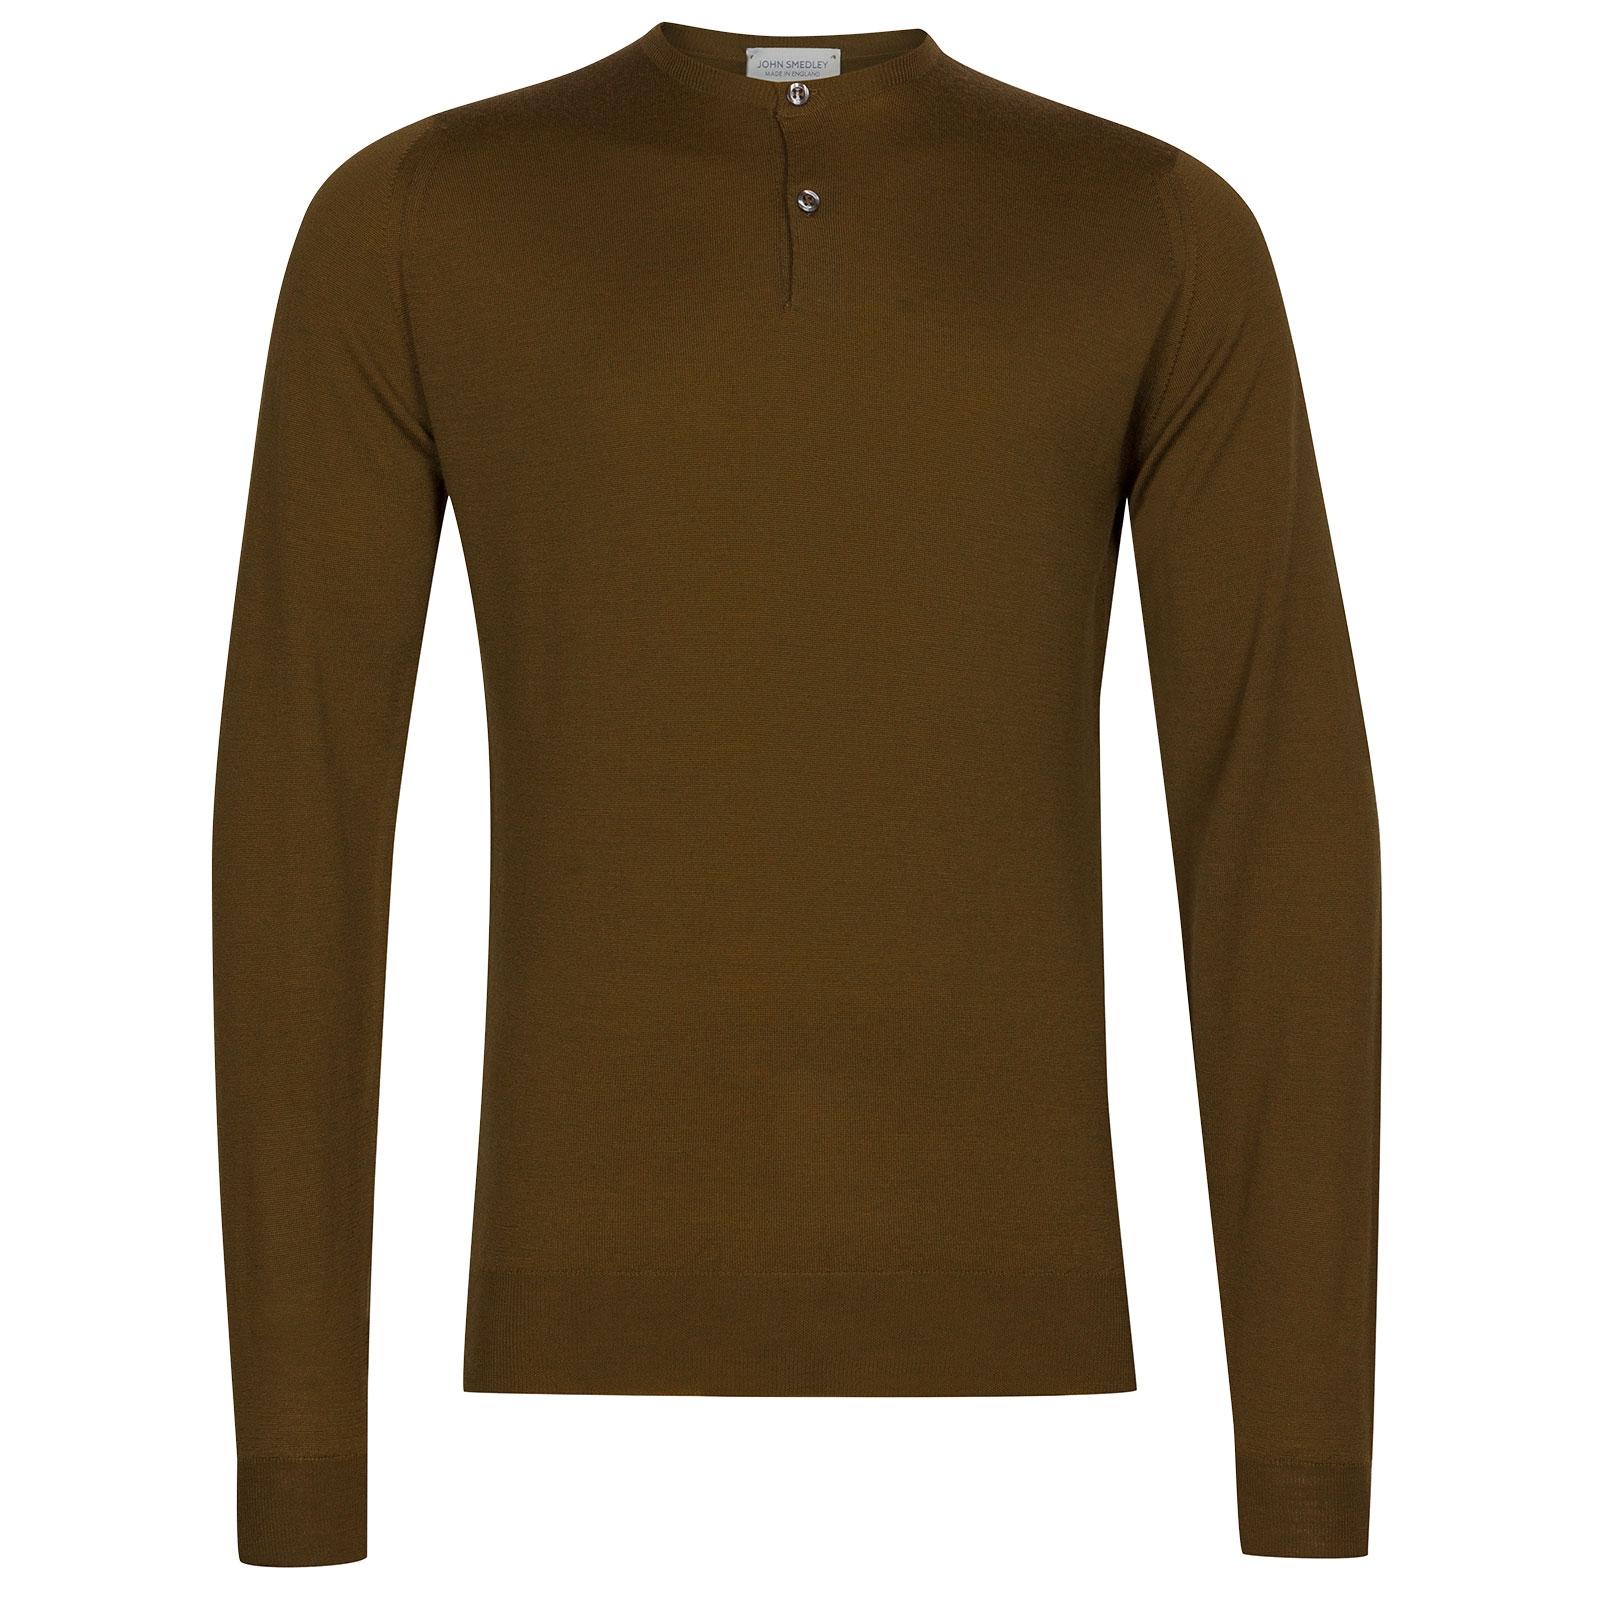 John Smedley Russet Merino Wool Henley Shirt in Khaki-XL